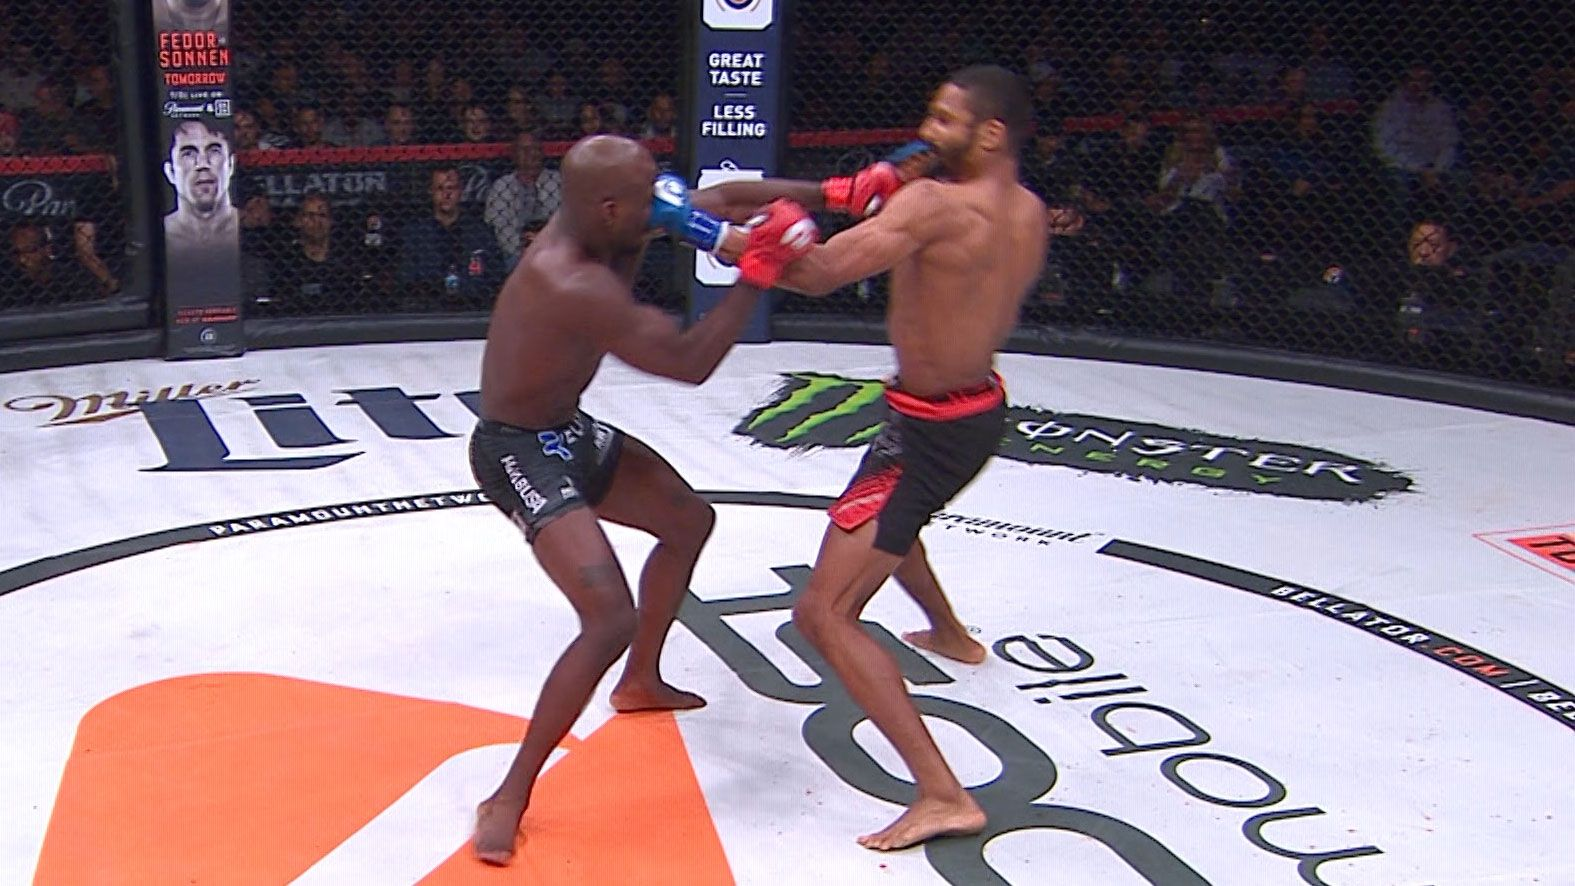 video of Carrington Banks vs. Mandel Nallo